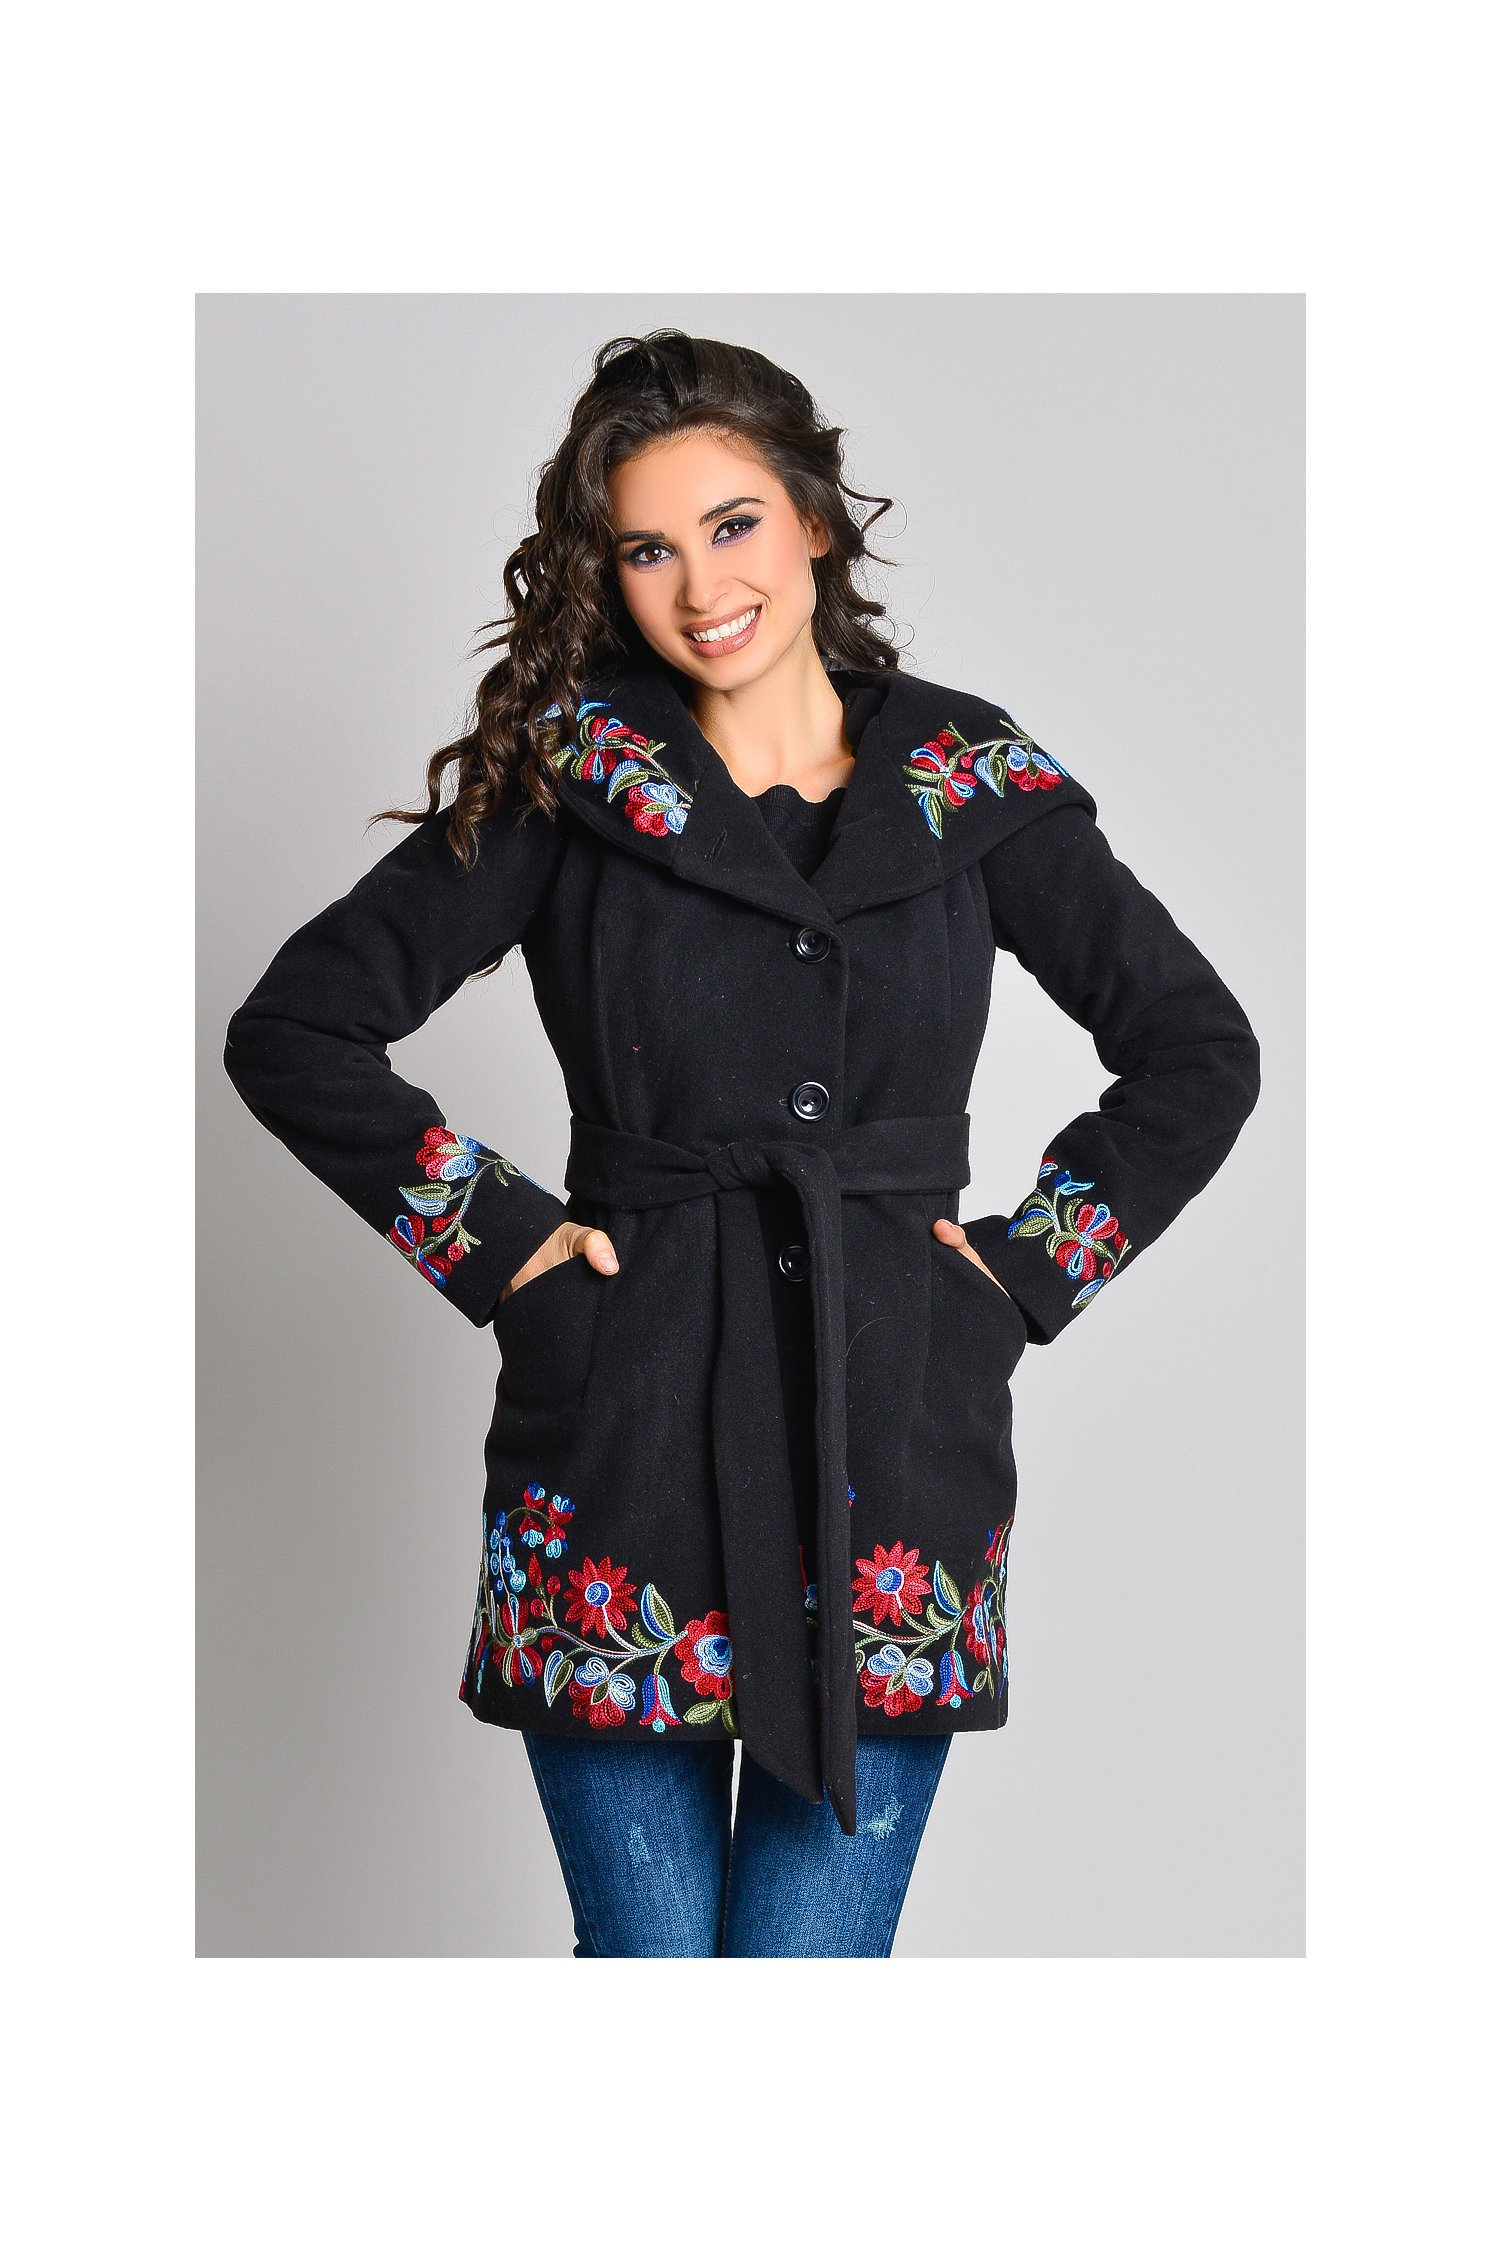 Palton negru elegant cu broderie florala